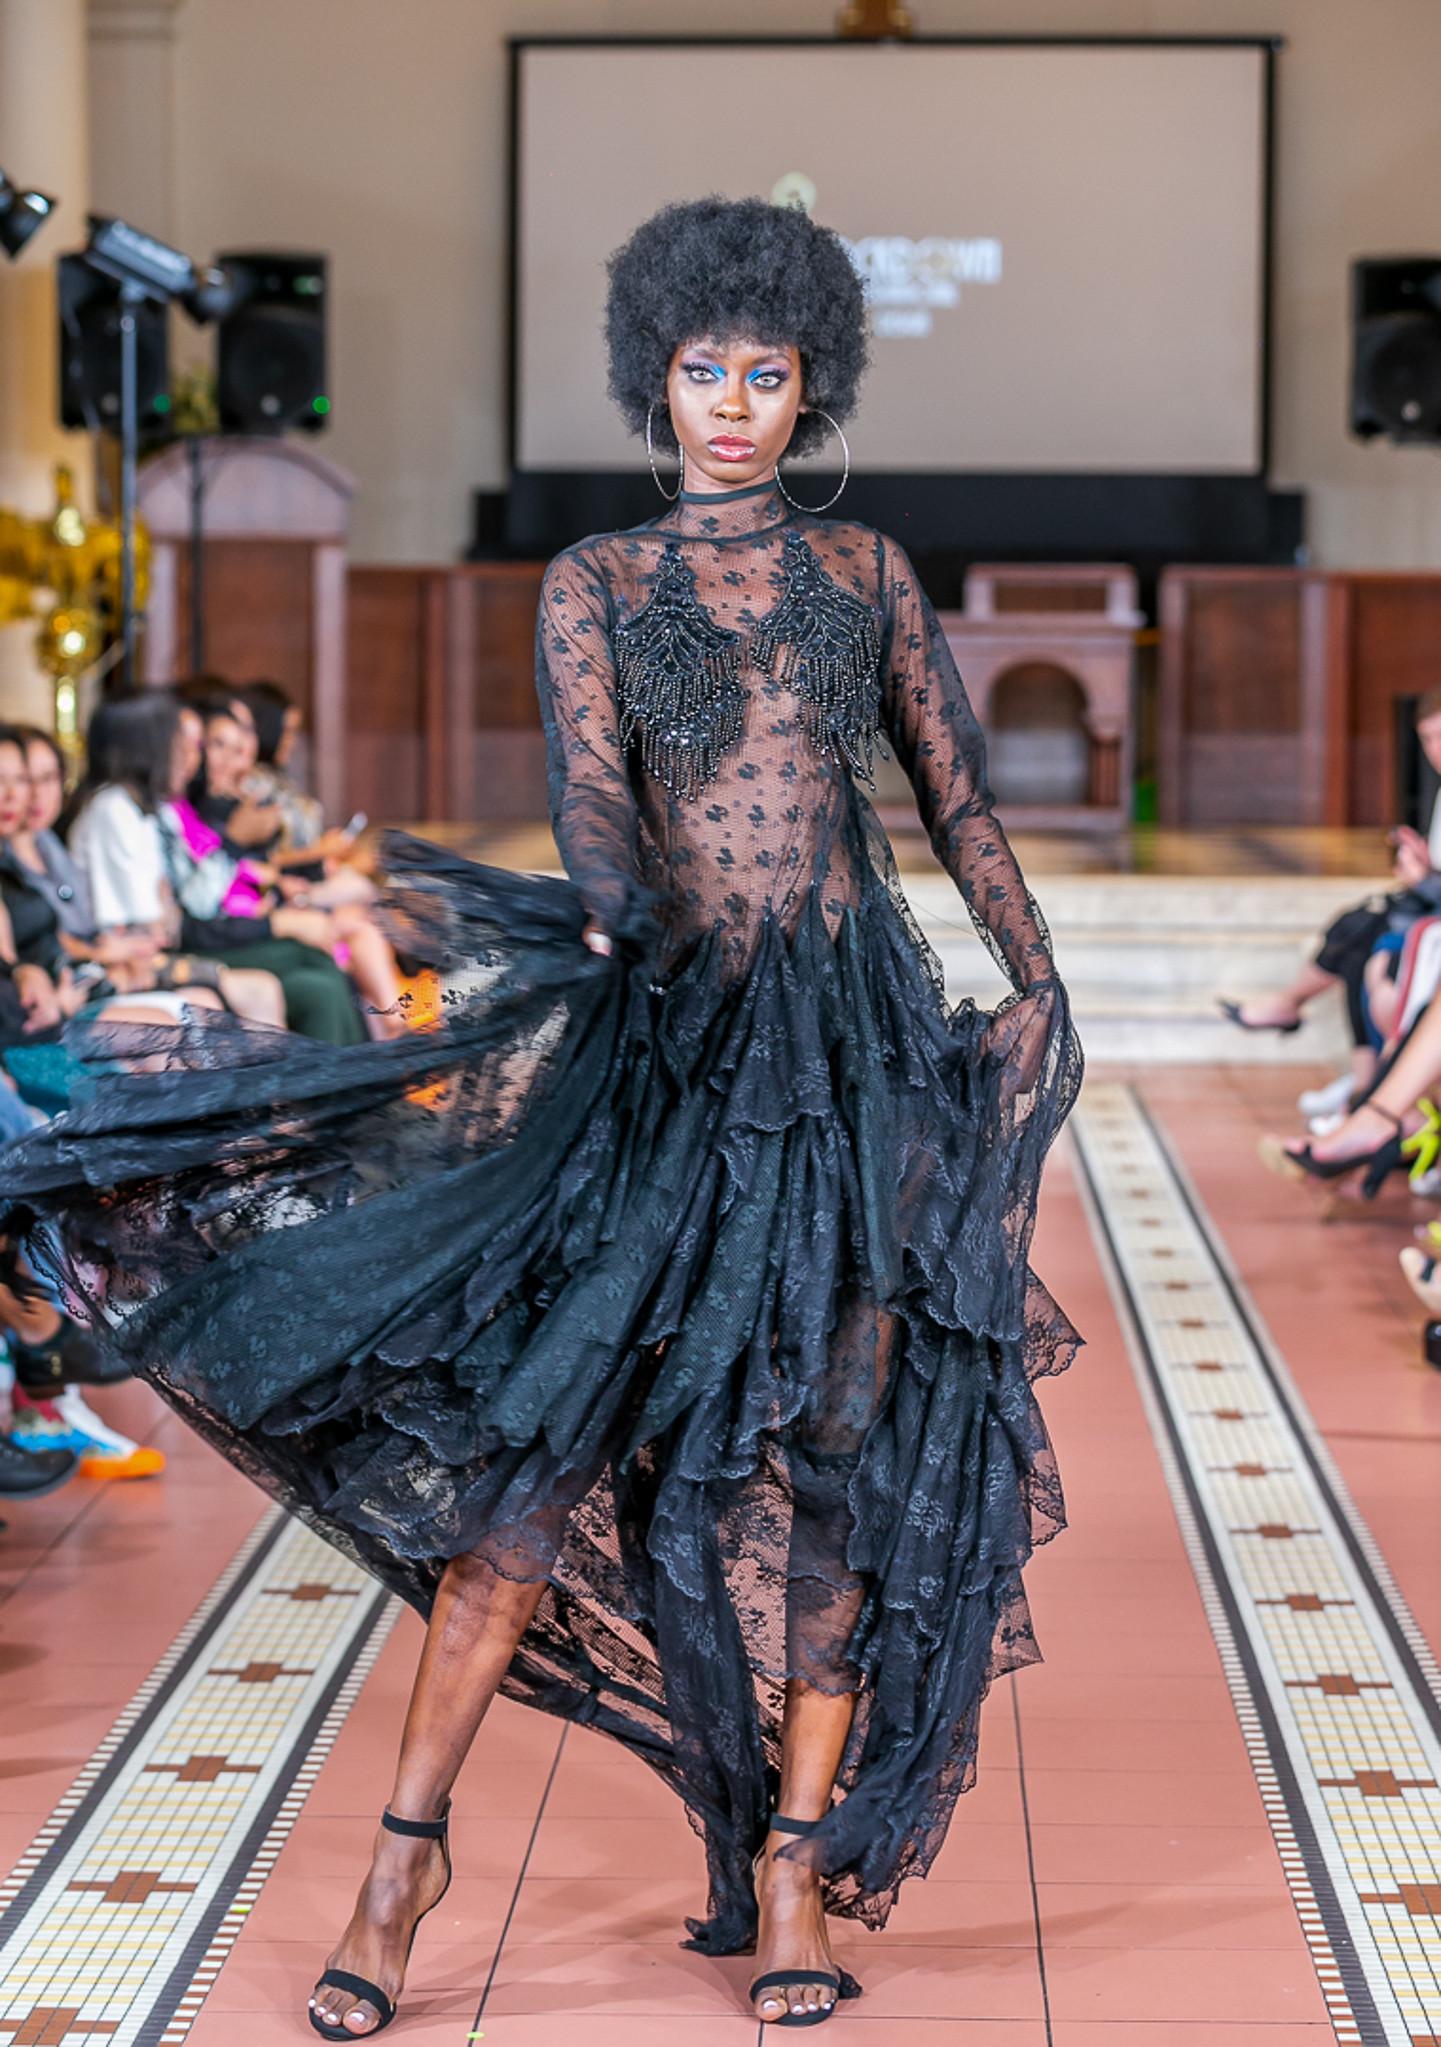 lockdown-international-design-fashion-sizzle-nyfw-2019-7